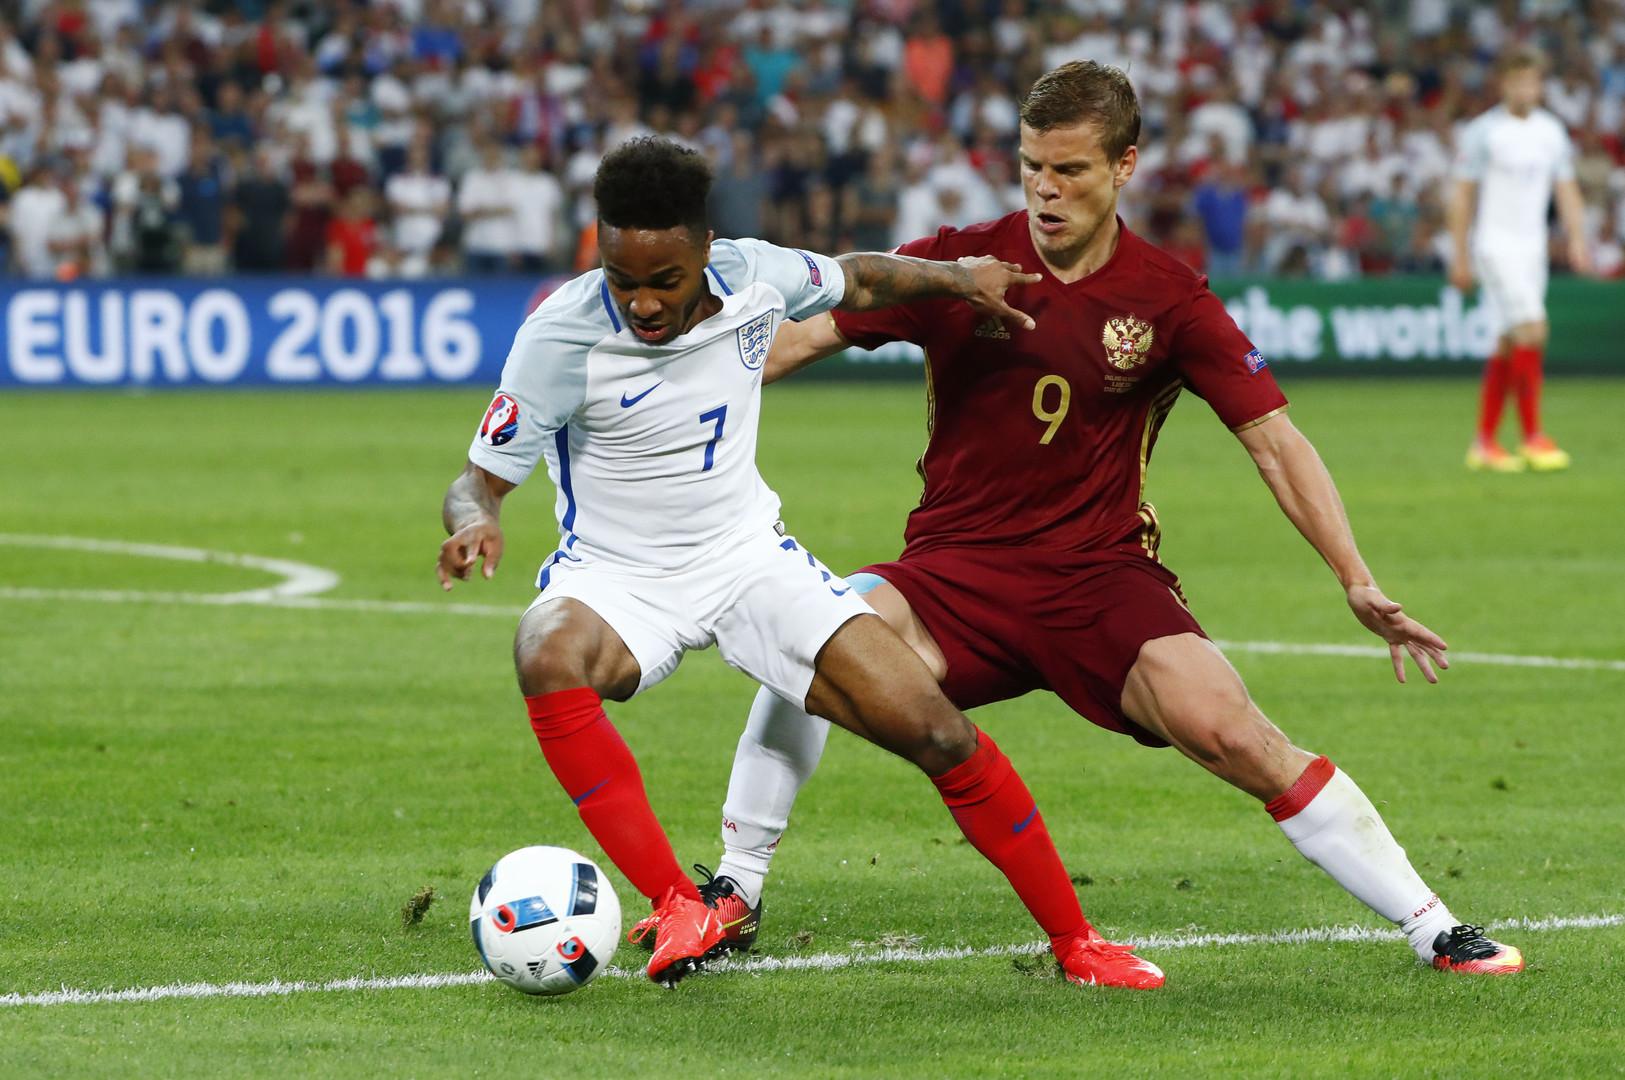 Englands Raheem Sterling im Zweikampf mit Russlands Aleksandr Kokorin